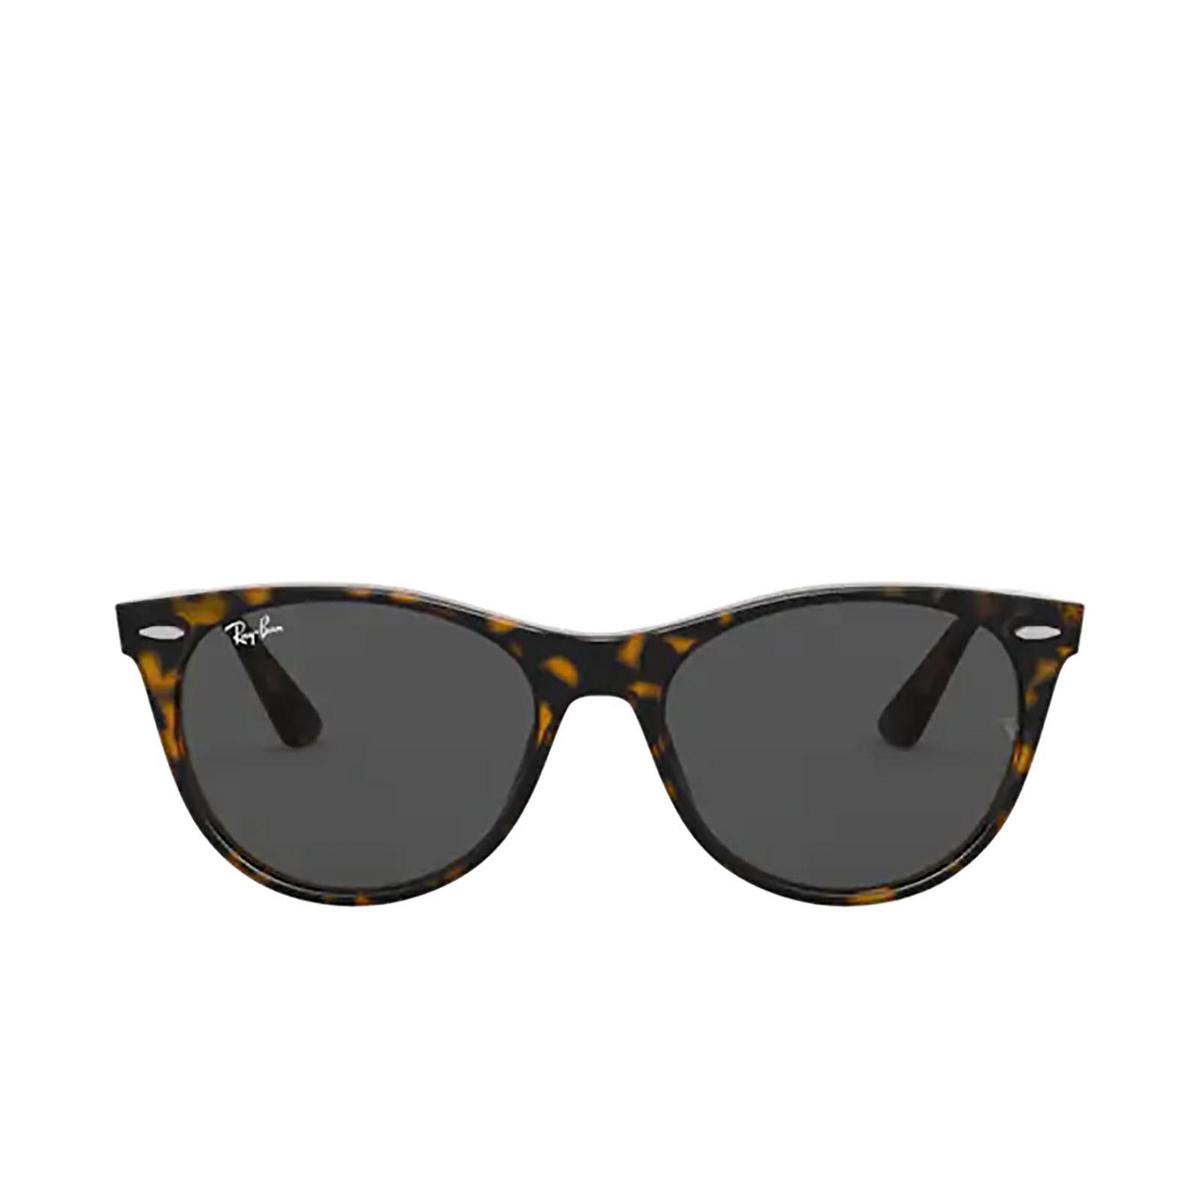 Ray-Ban® Round Sunglasses: Wayfarer Ii RB2185 color Havana On Transparent Light Bro 1292B1 - front view.